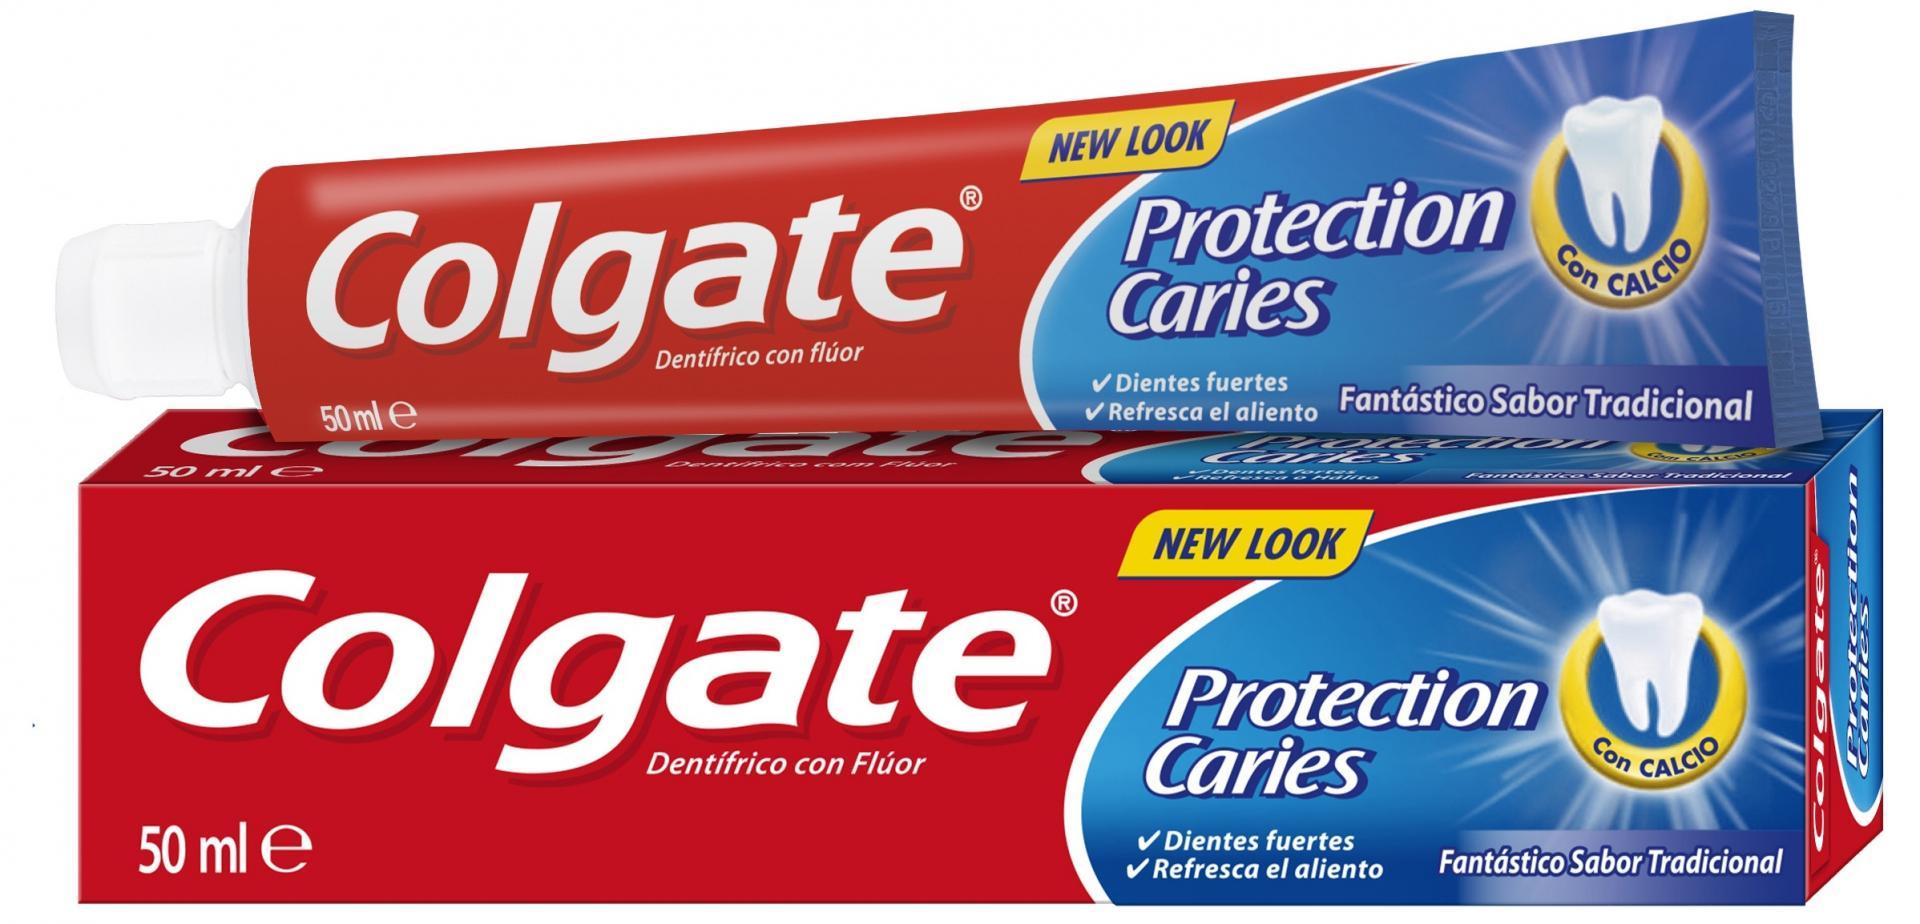 Dentífrico Colgate Protección Caries 50 ml.